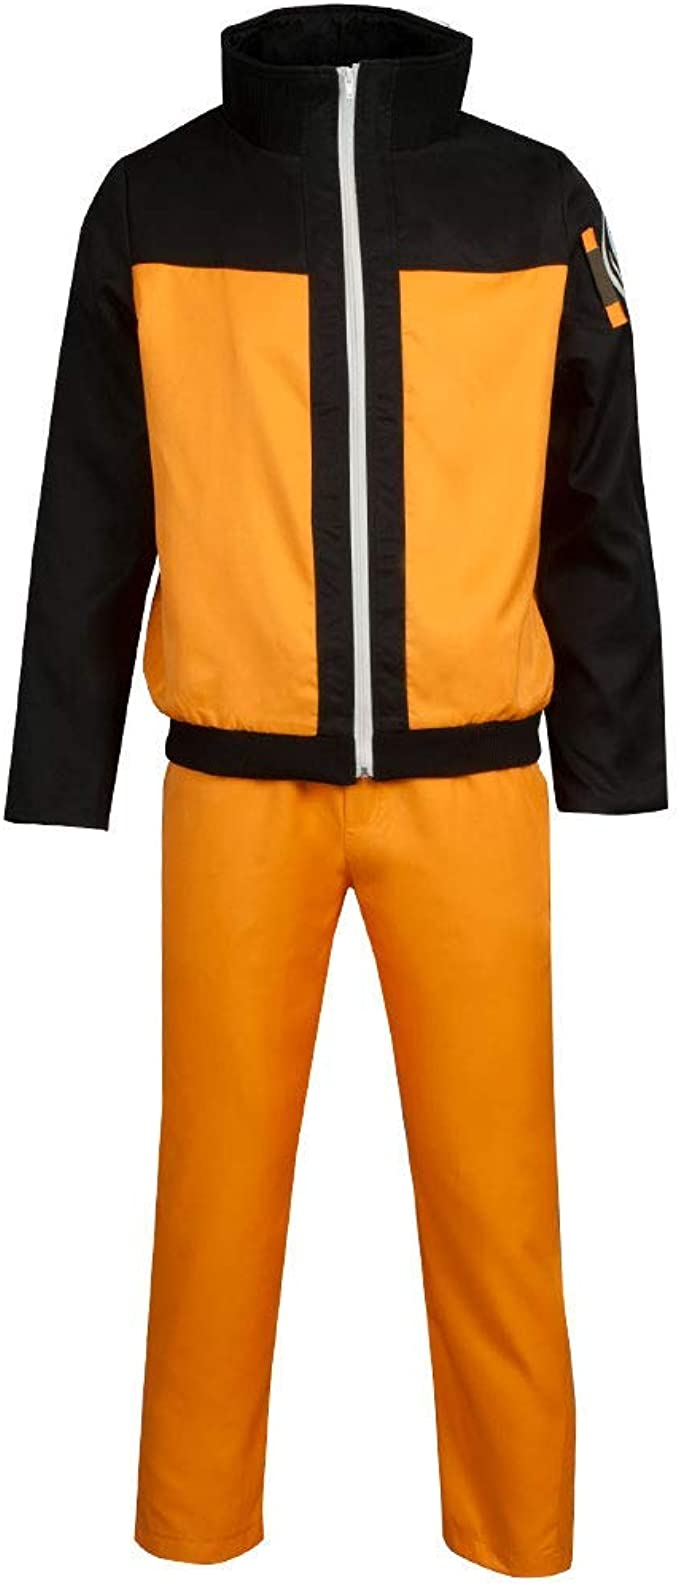 CosplayLife Naruto Shippuden Naruto Uzumaki Disfraz para Hombre ...